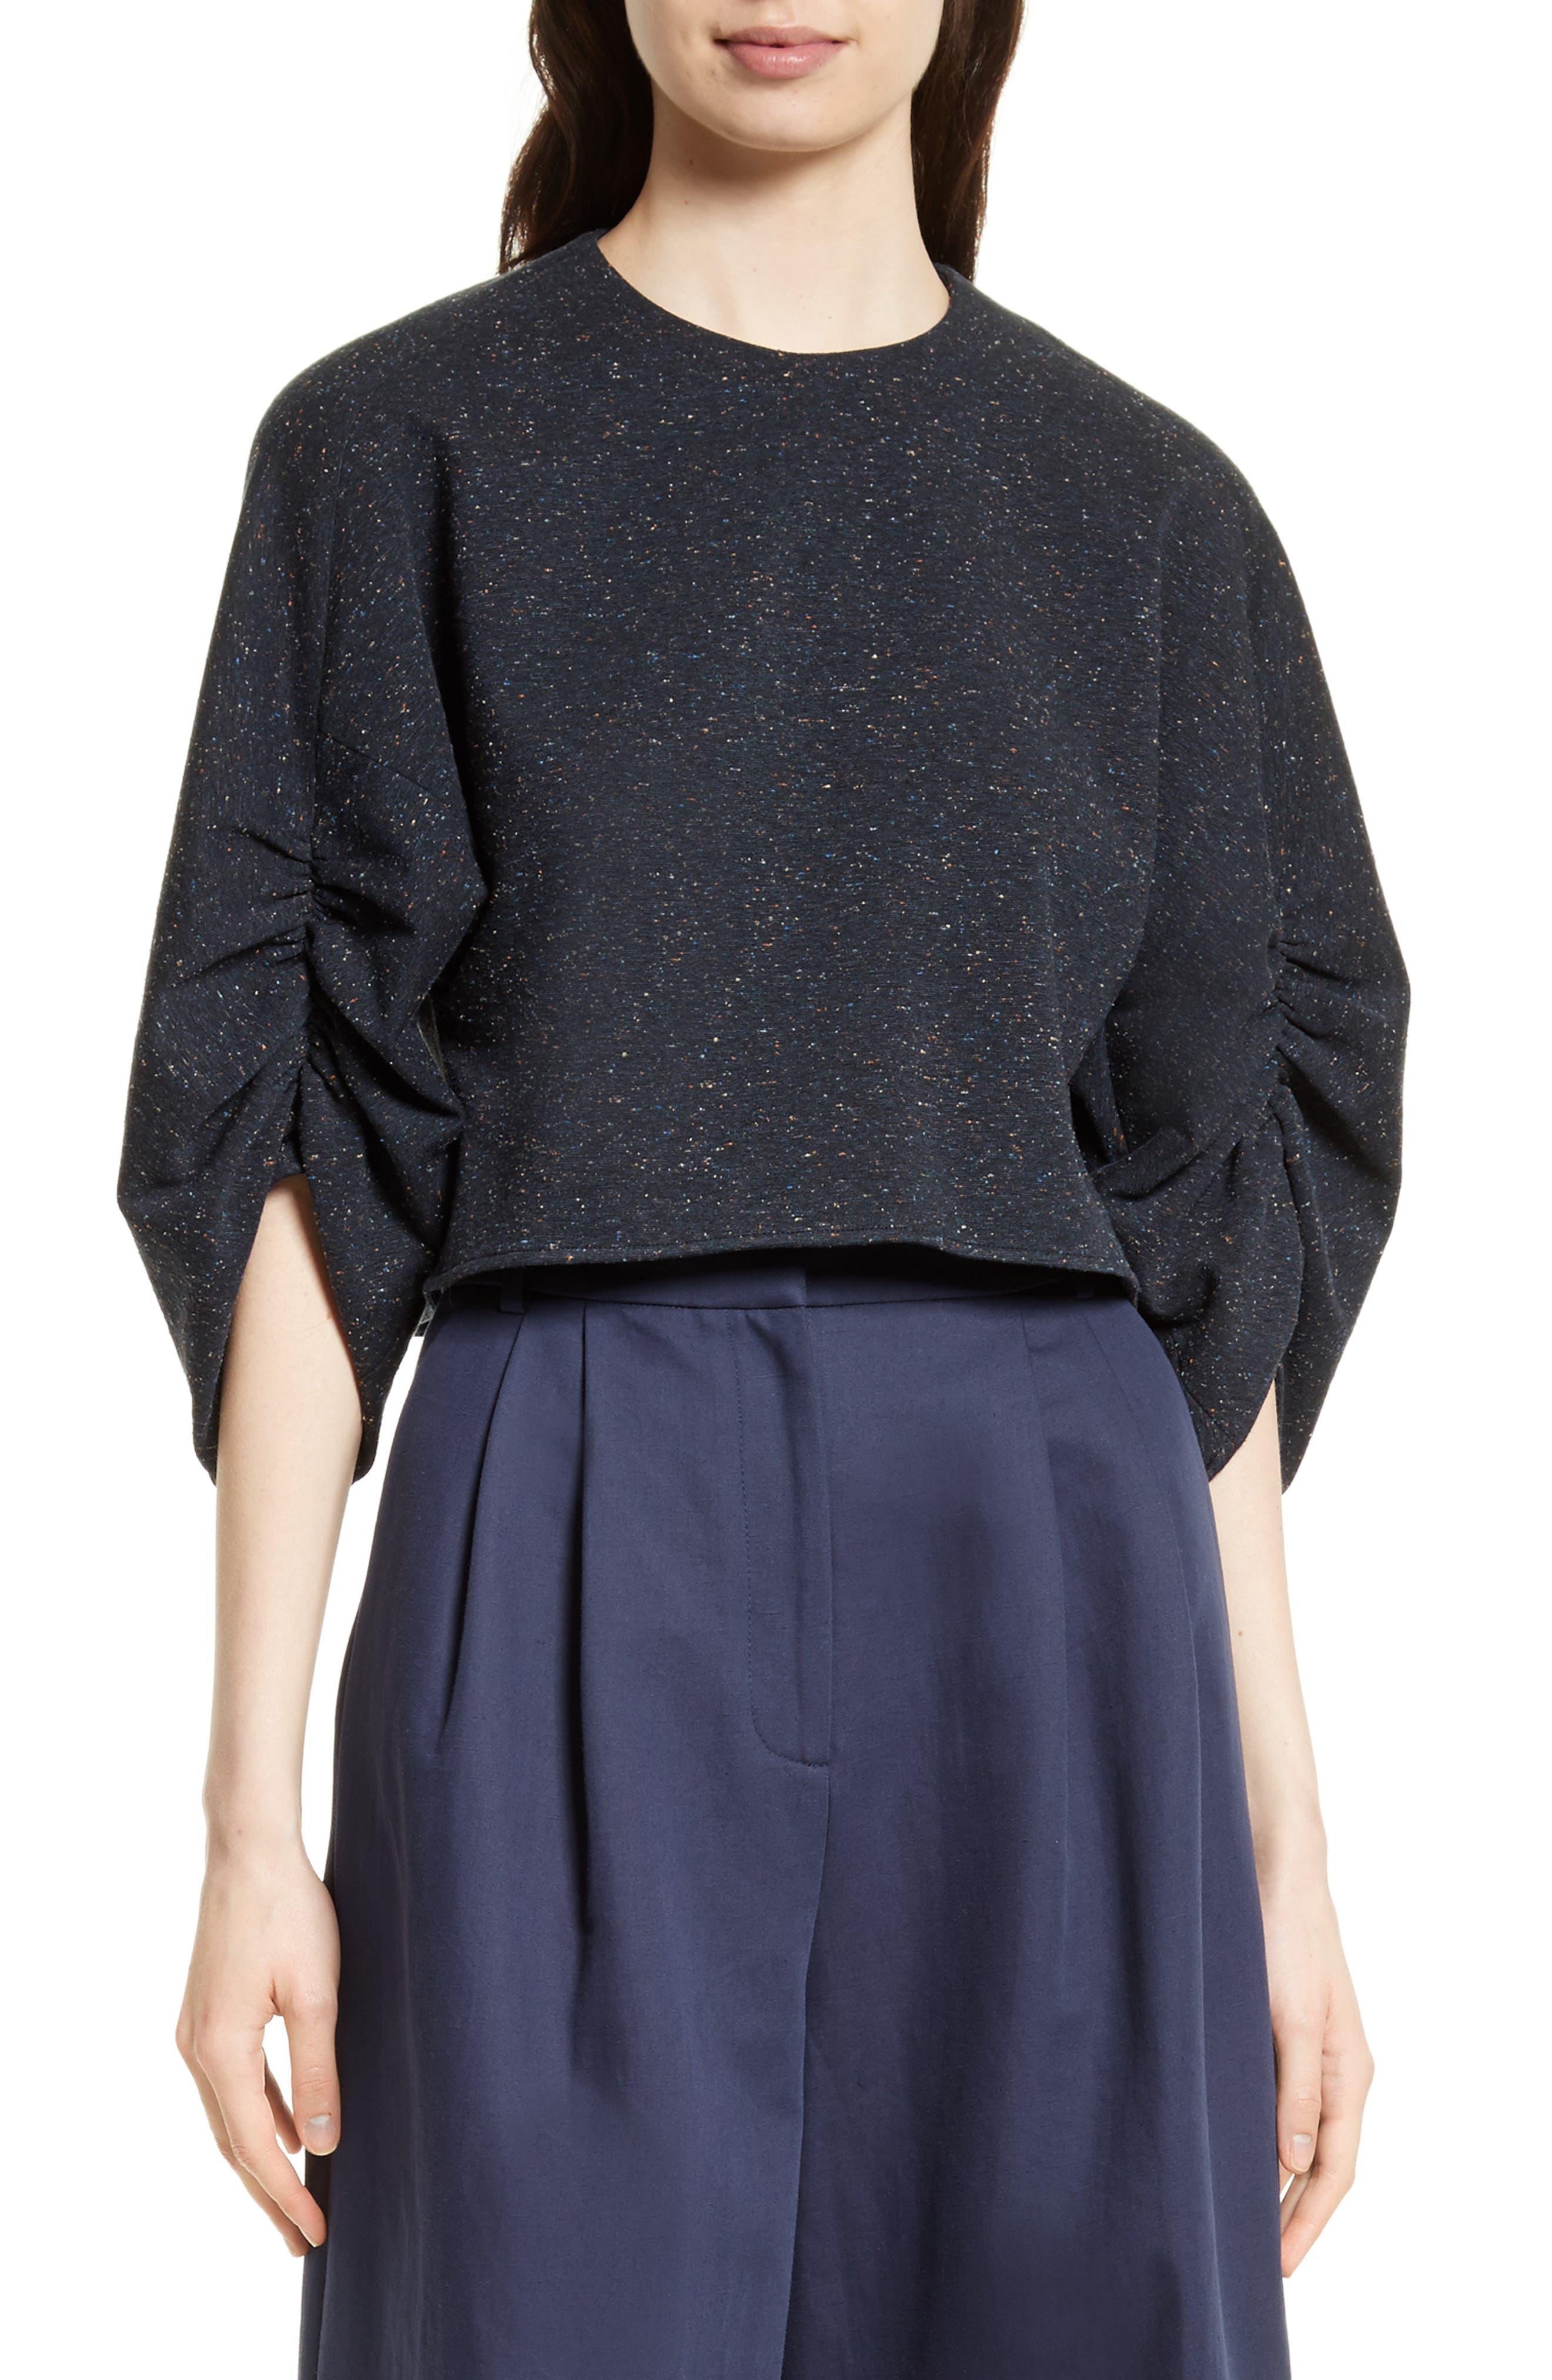 Alternate Image 1 Selected - Tibi Imogen Tweed Top